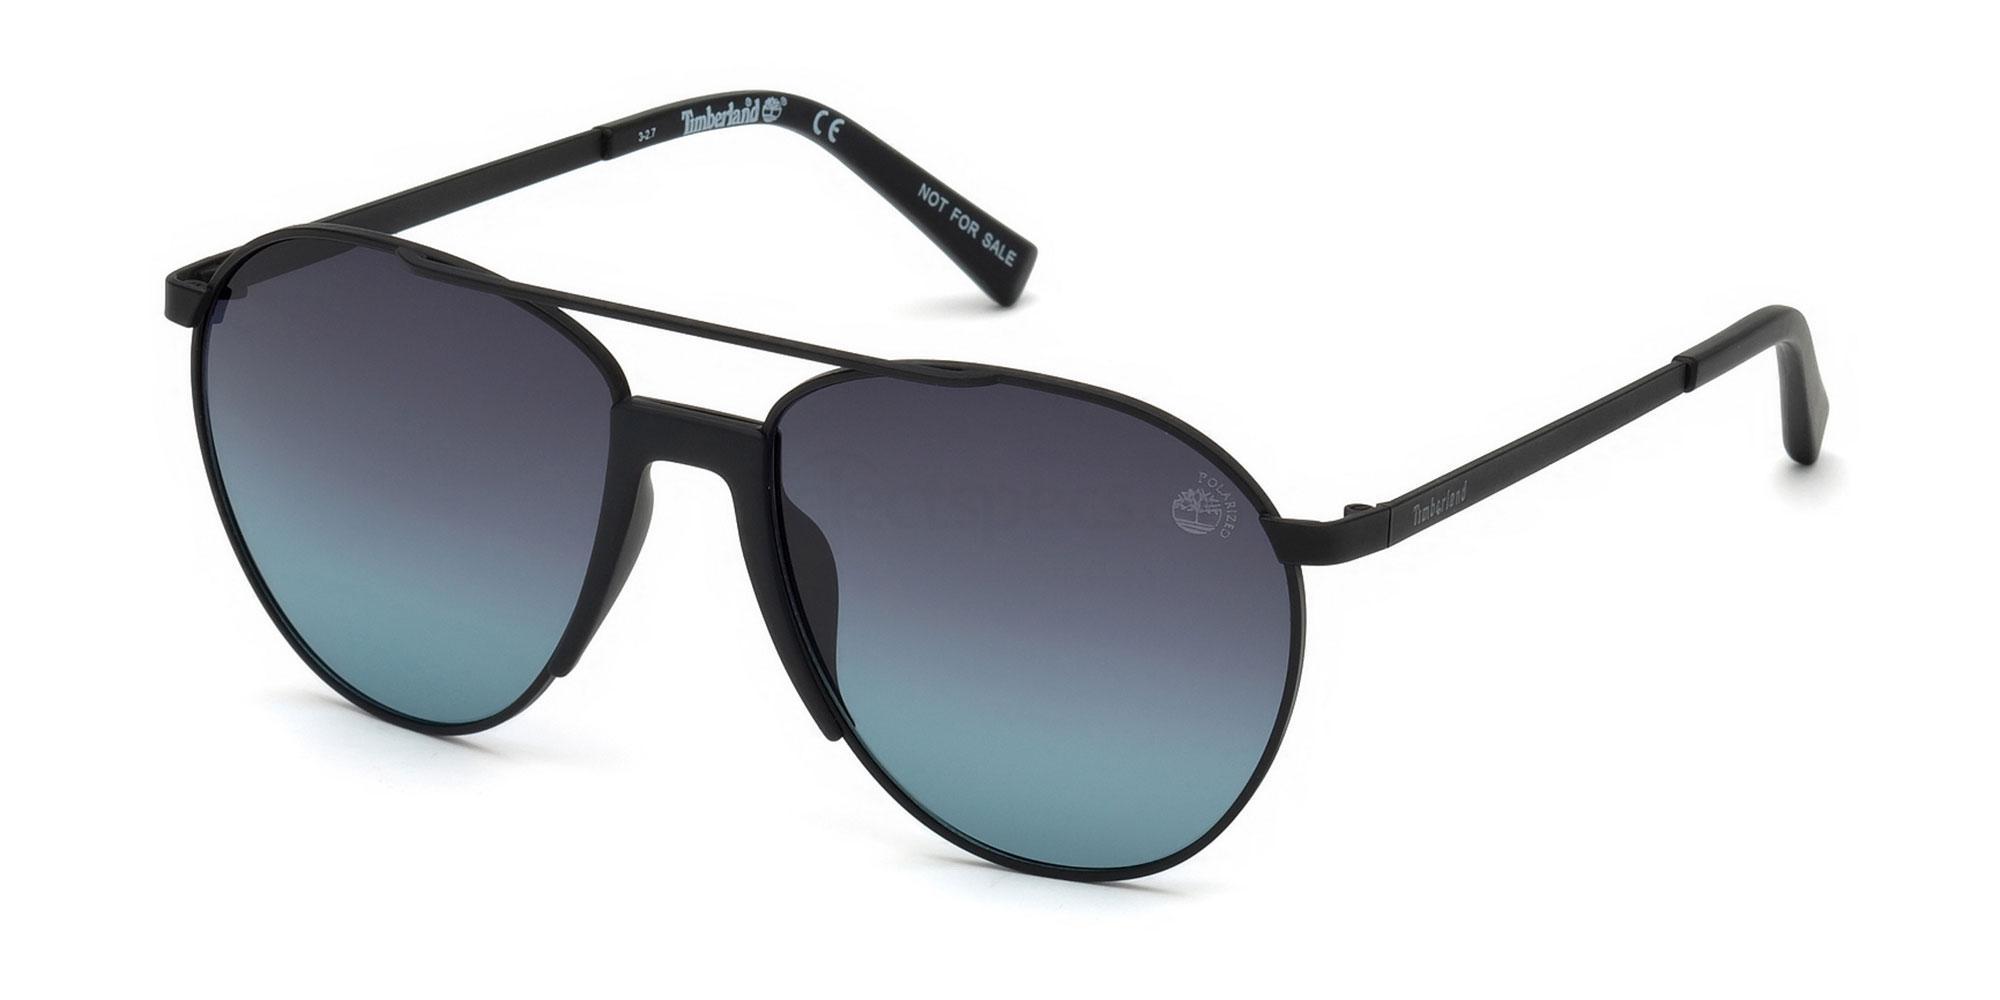 05D TB9149 Sunglasses, Timberland